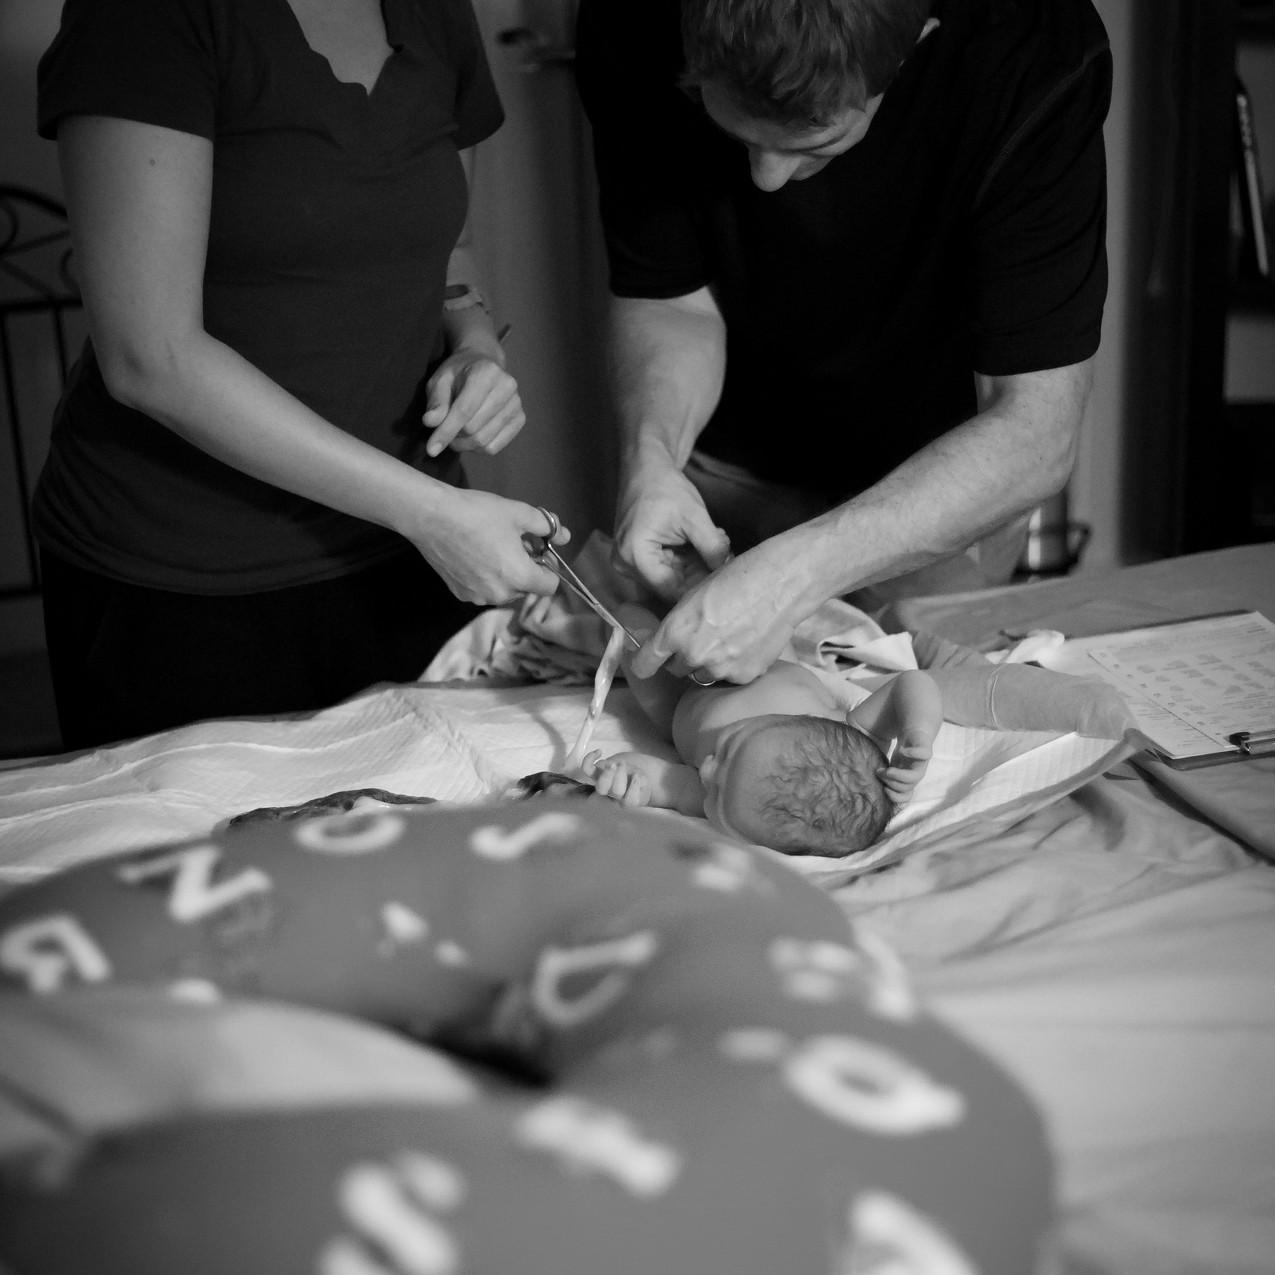 TampaBirthPhotographerLaborOfLoveBirthCenterLaborofLovebirthcenterTampaTampa Birth Photographer Tampa newborn Photographer in water birth Labor of love Lutz Fl_Jan252017_0276 copy